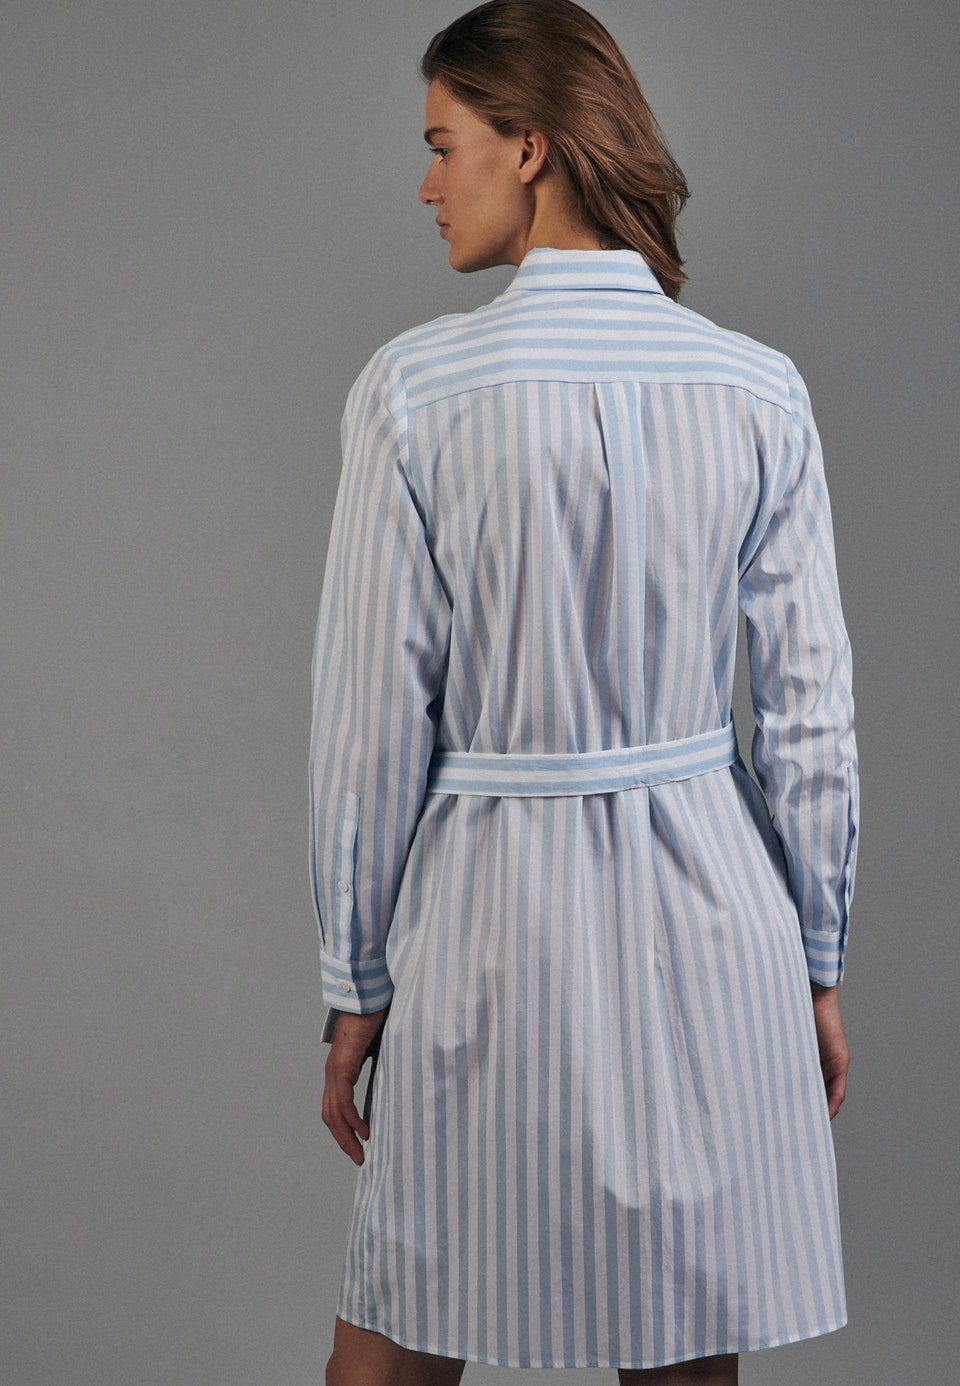 Popeline Midi Dress made of 100% Cotton in Light blue |  Seidensticker Onlineshop